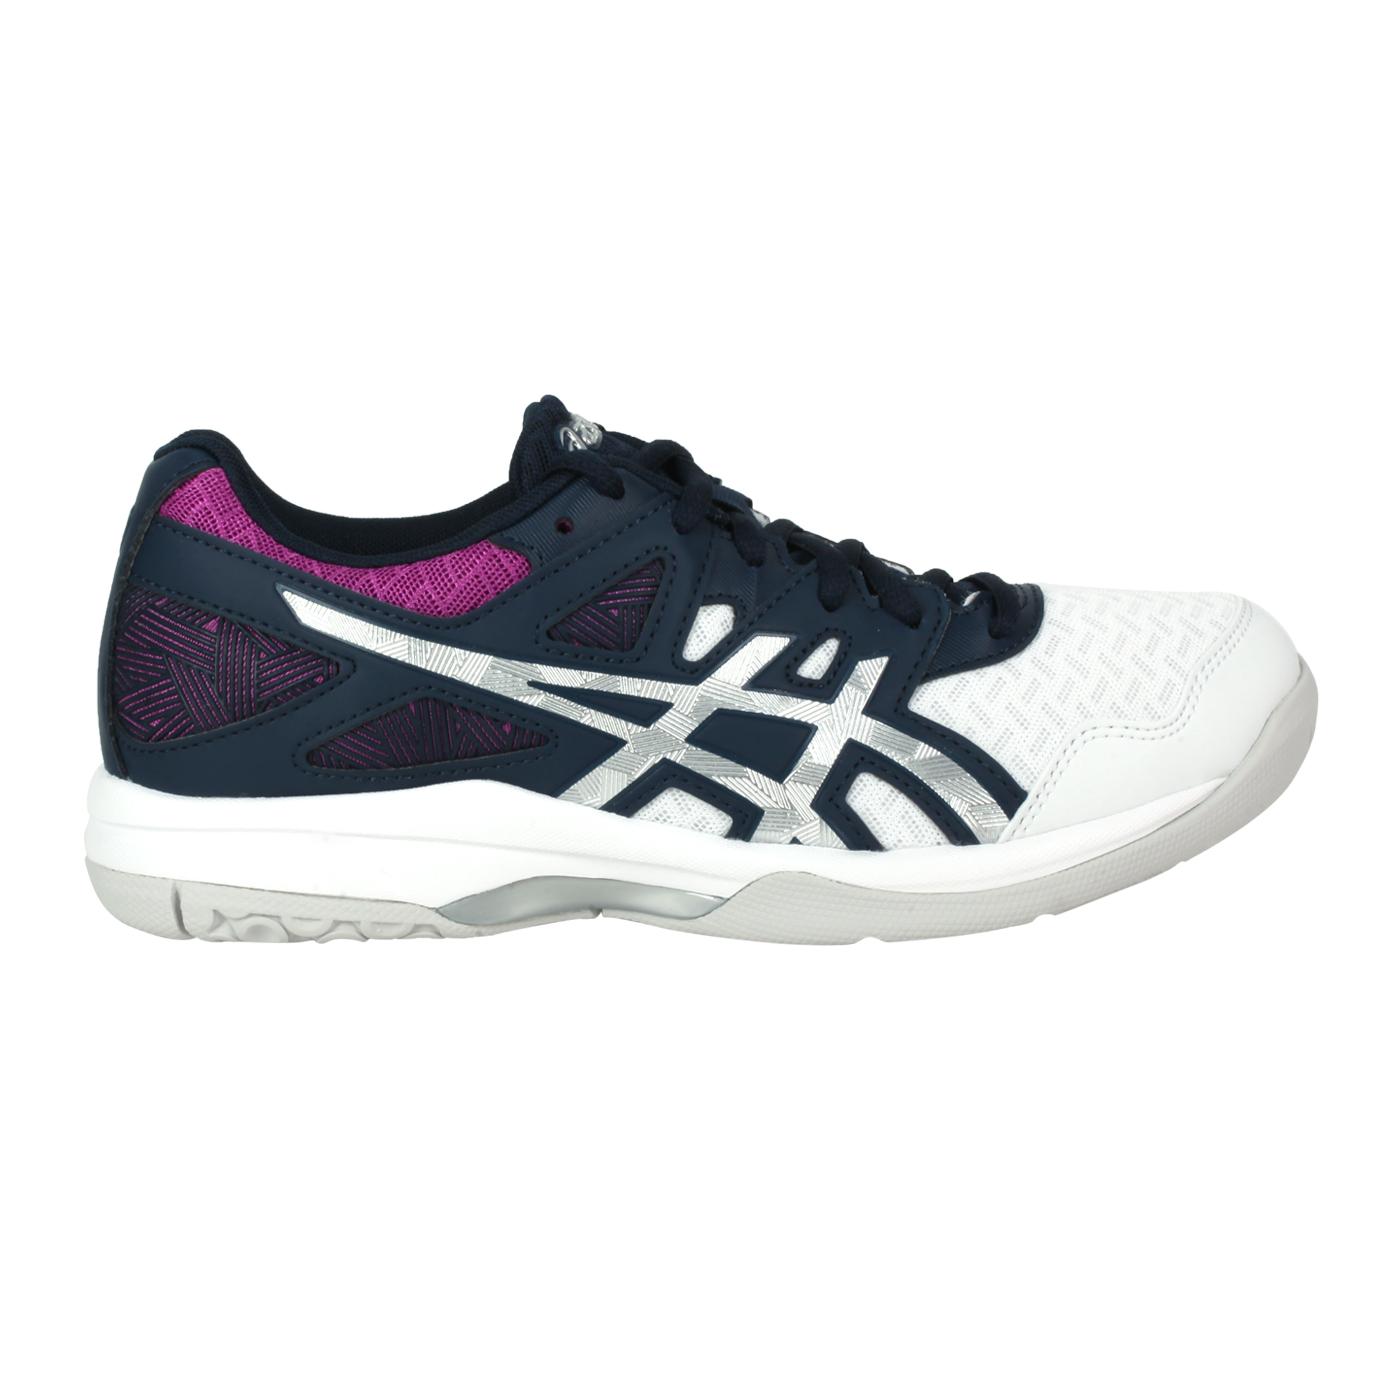 ASICS 女款排羽球鞋  @GEL-TASK 2@1072A038-403 - 墨藍銀紫白